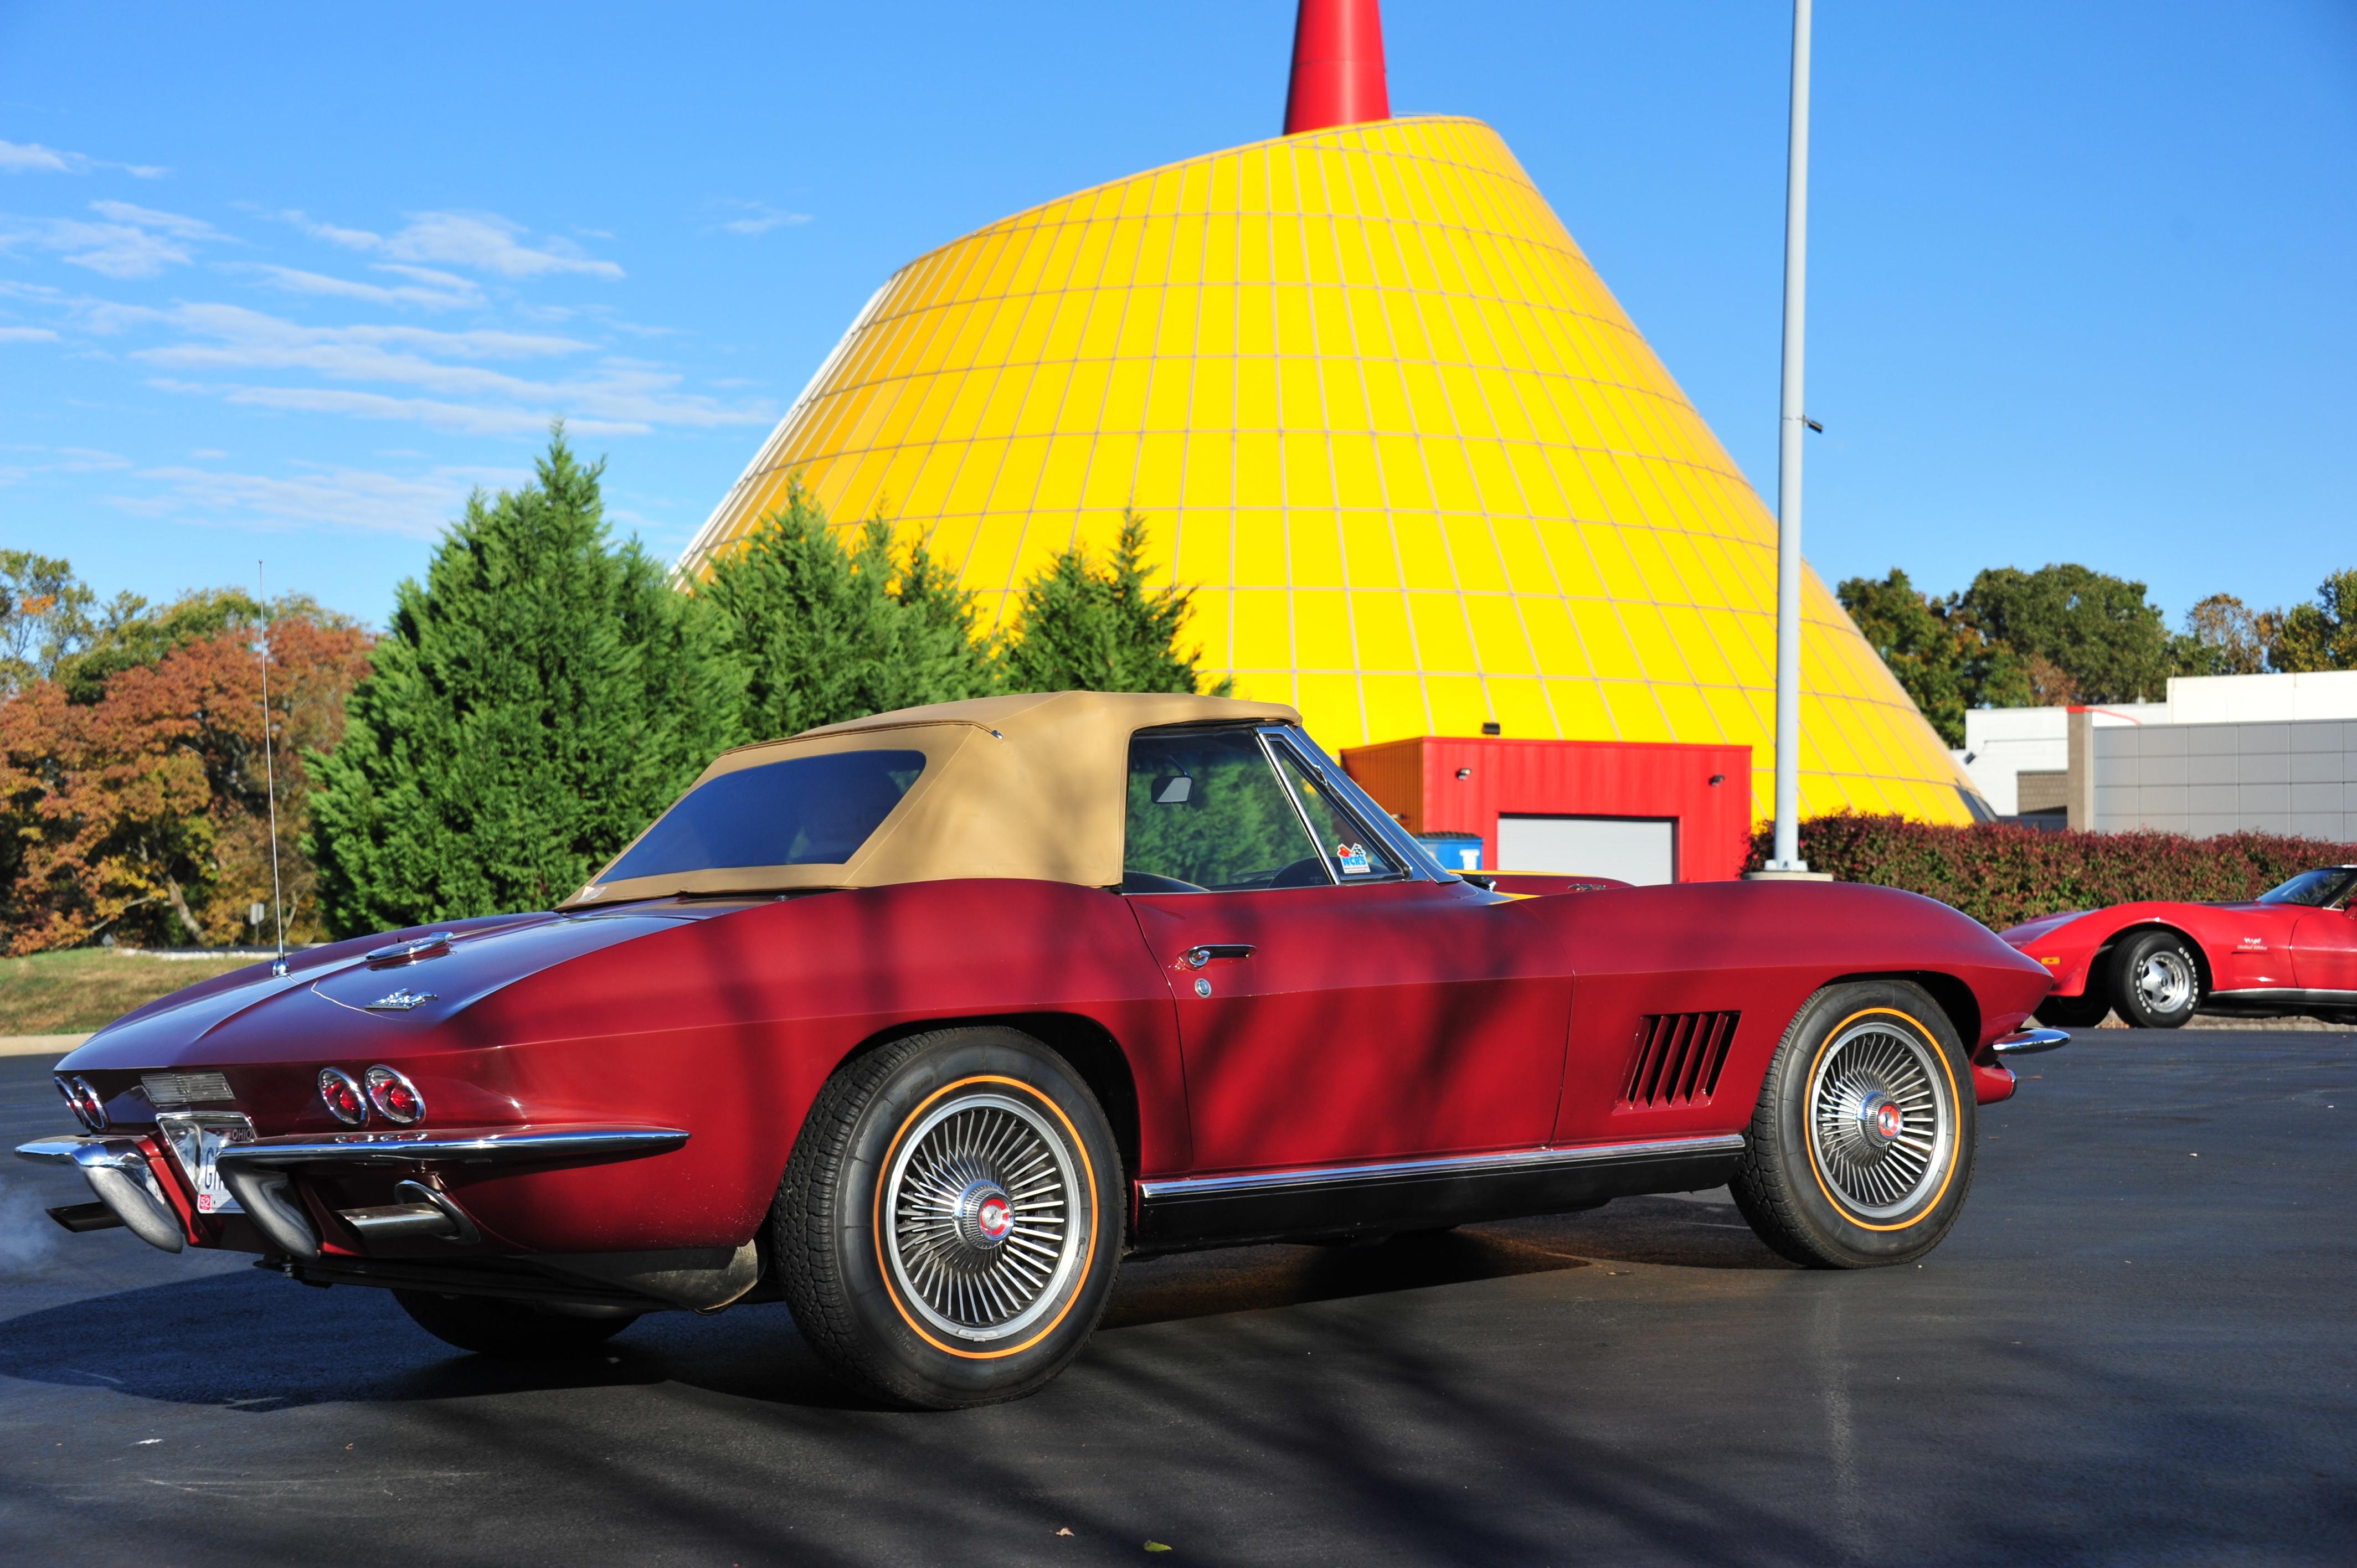 National Corvette Museum >> Museum Receives 1967 Corvette Donation – National Corvette ...